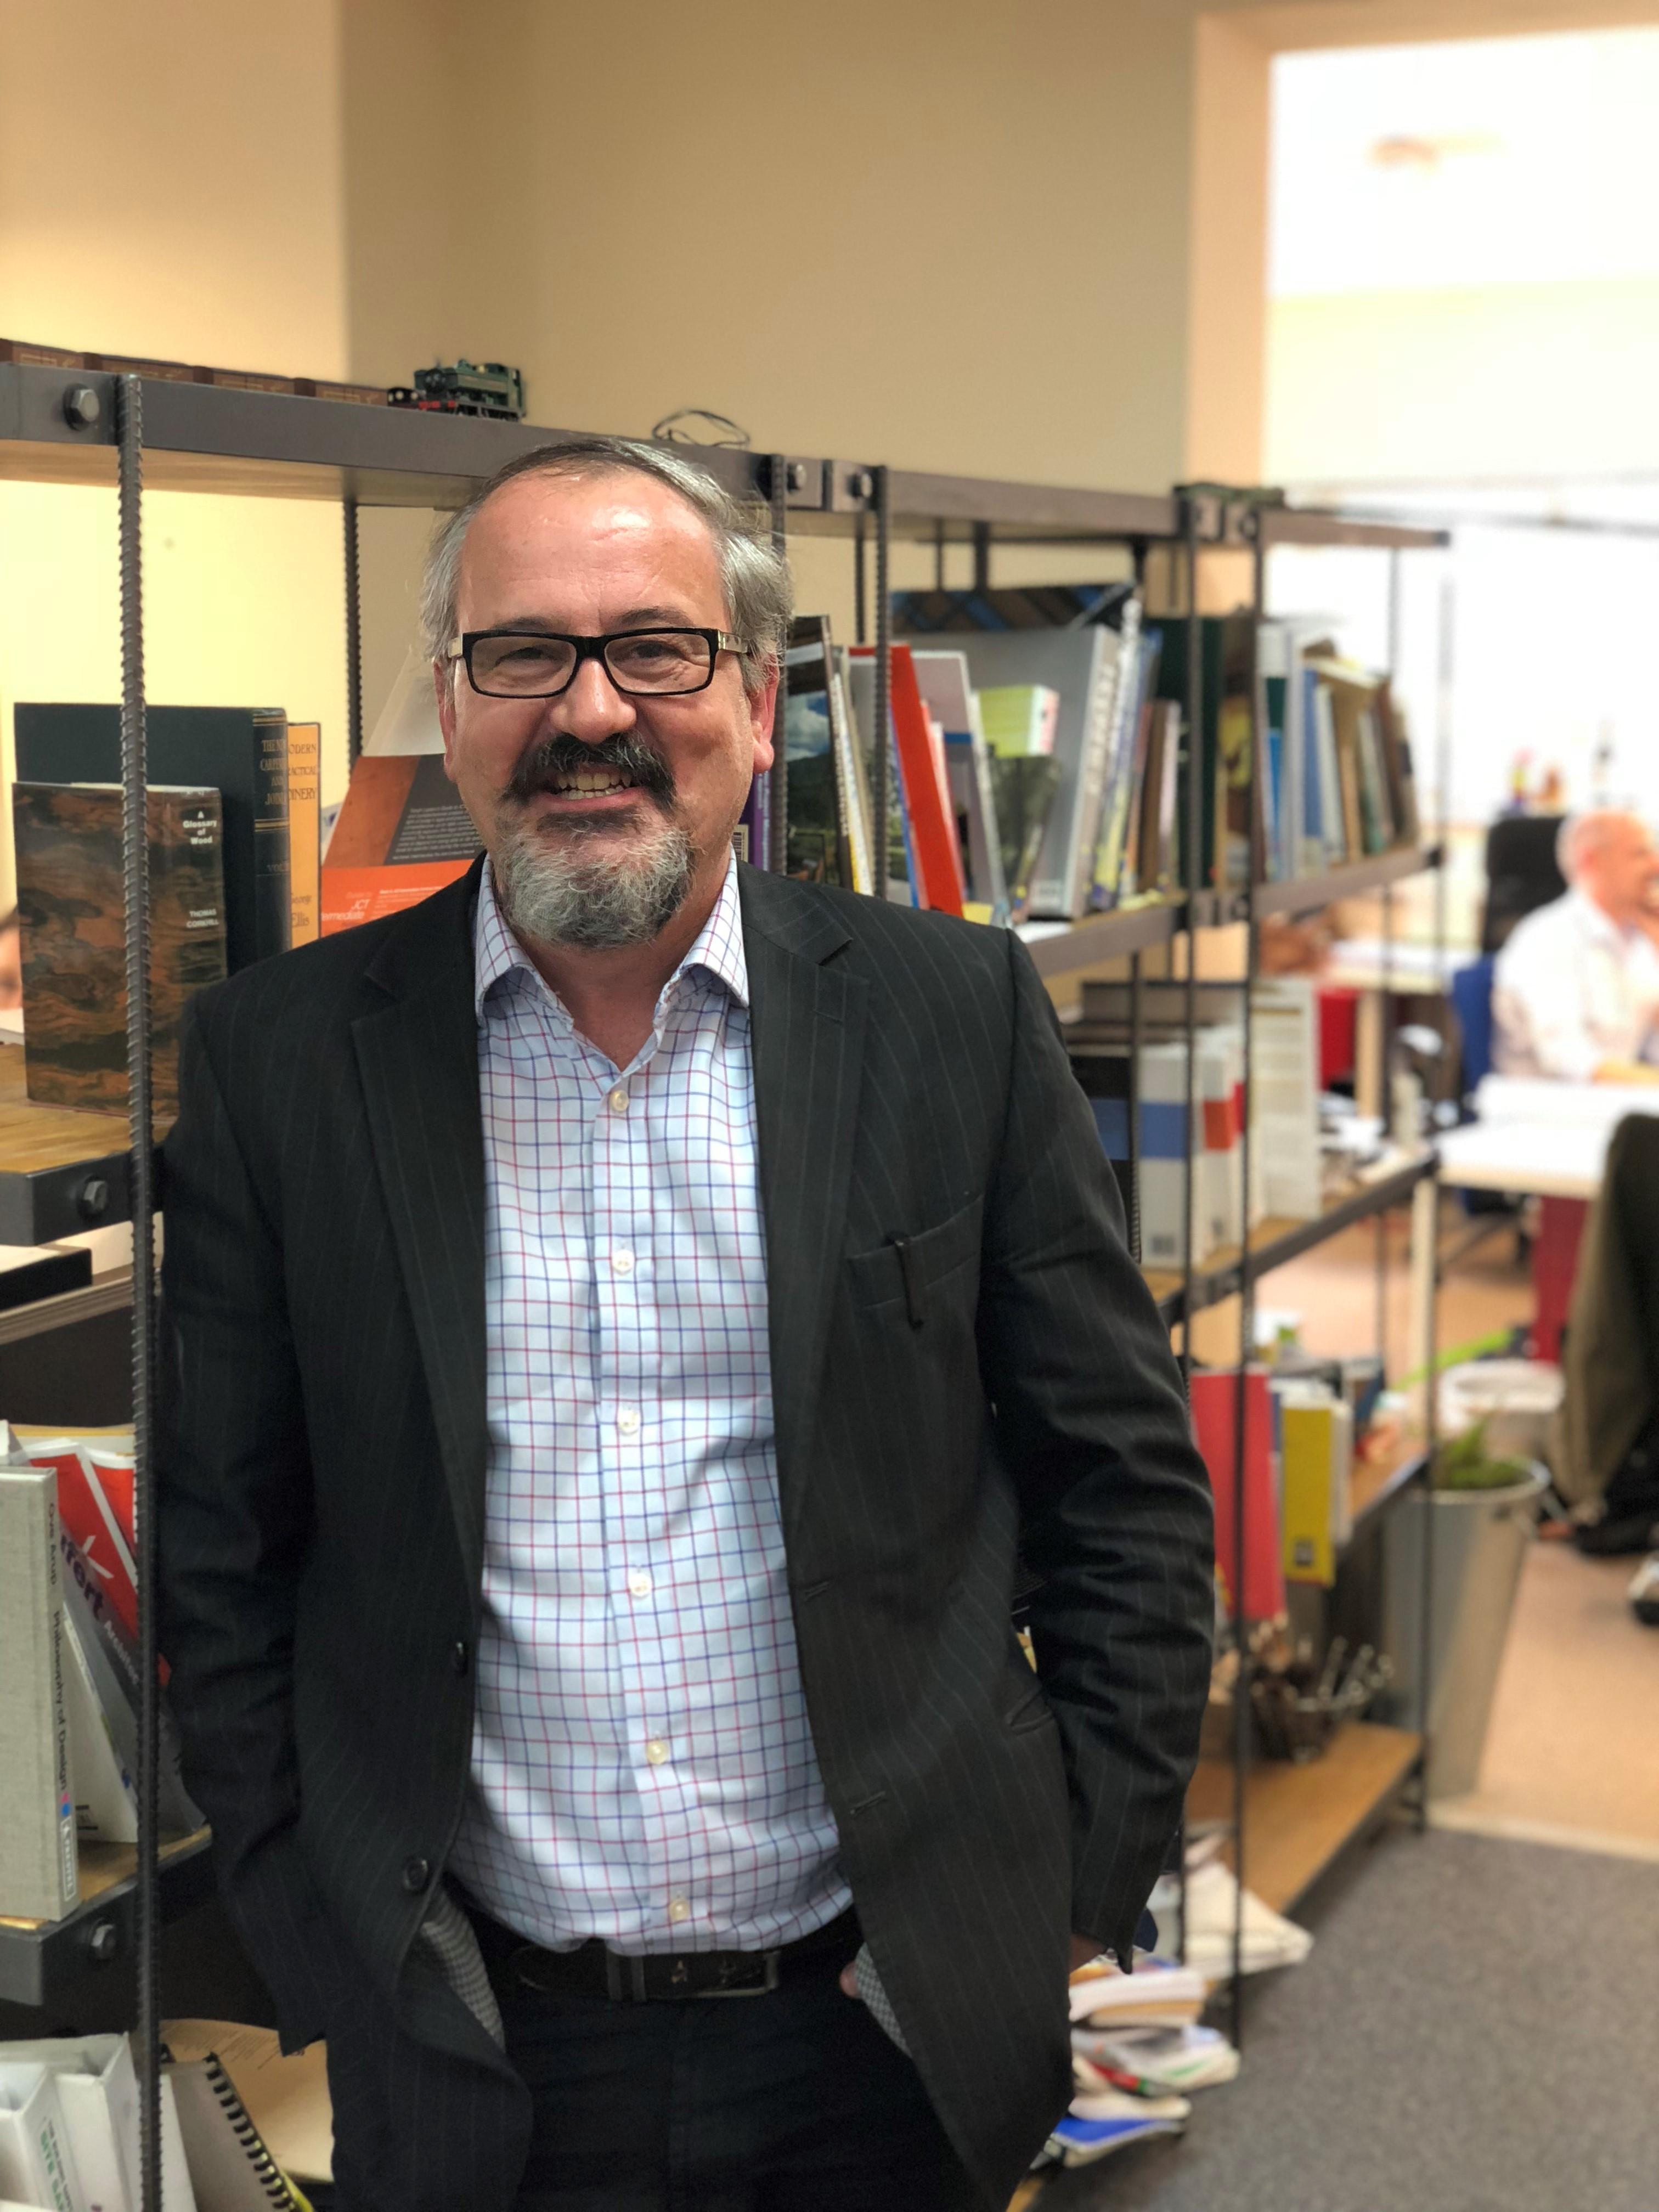 Paul Keegan MRICS DipSurv MBA